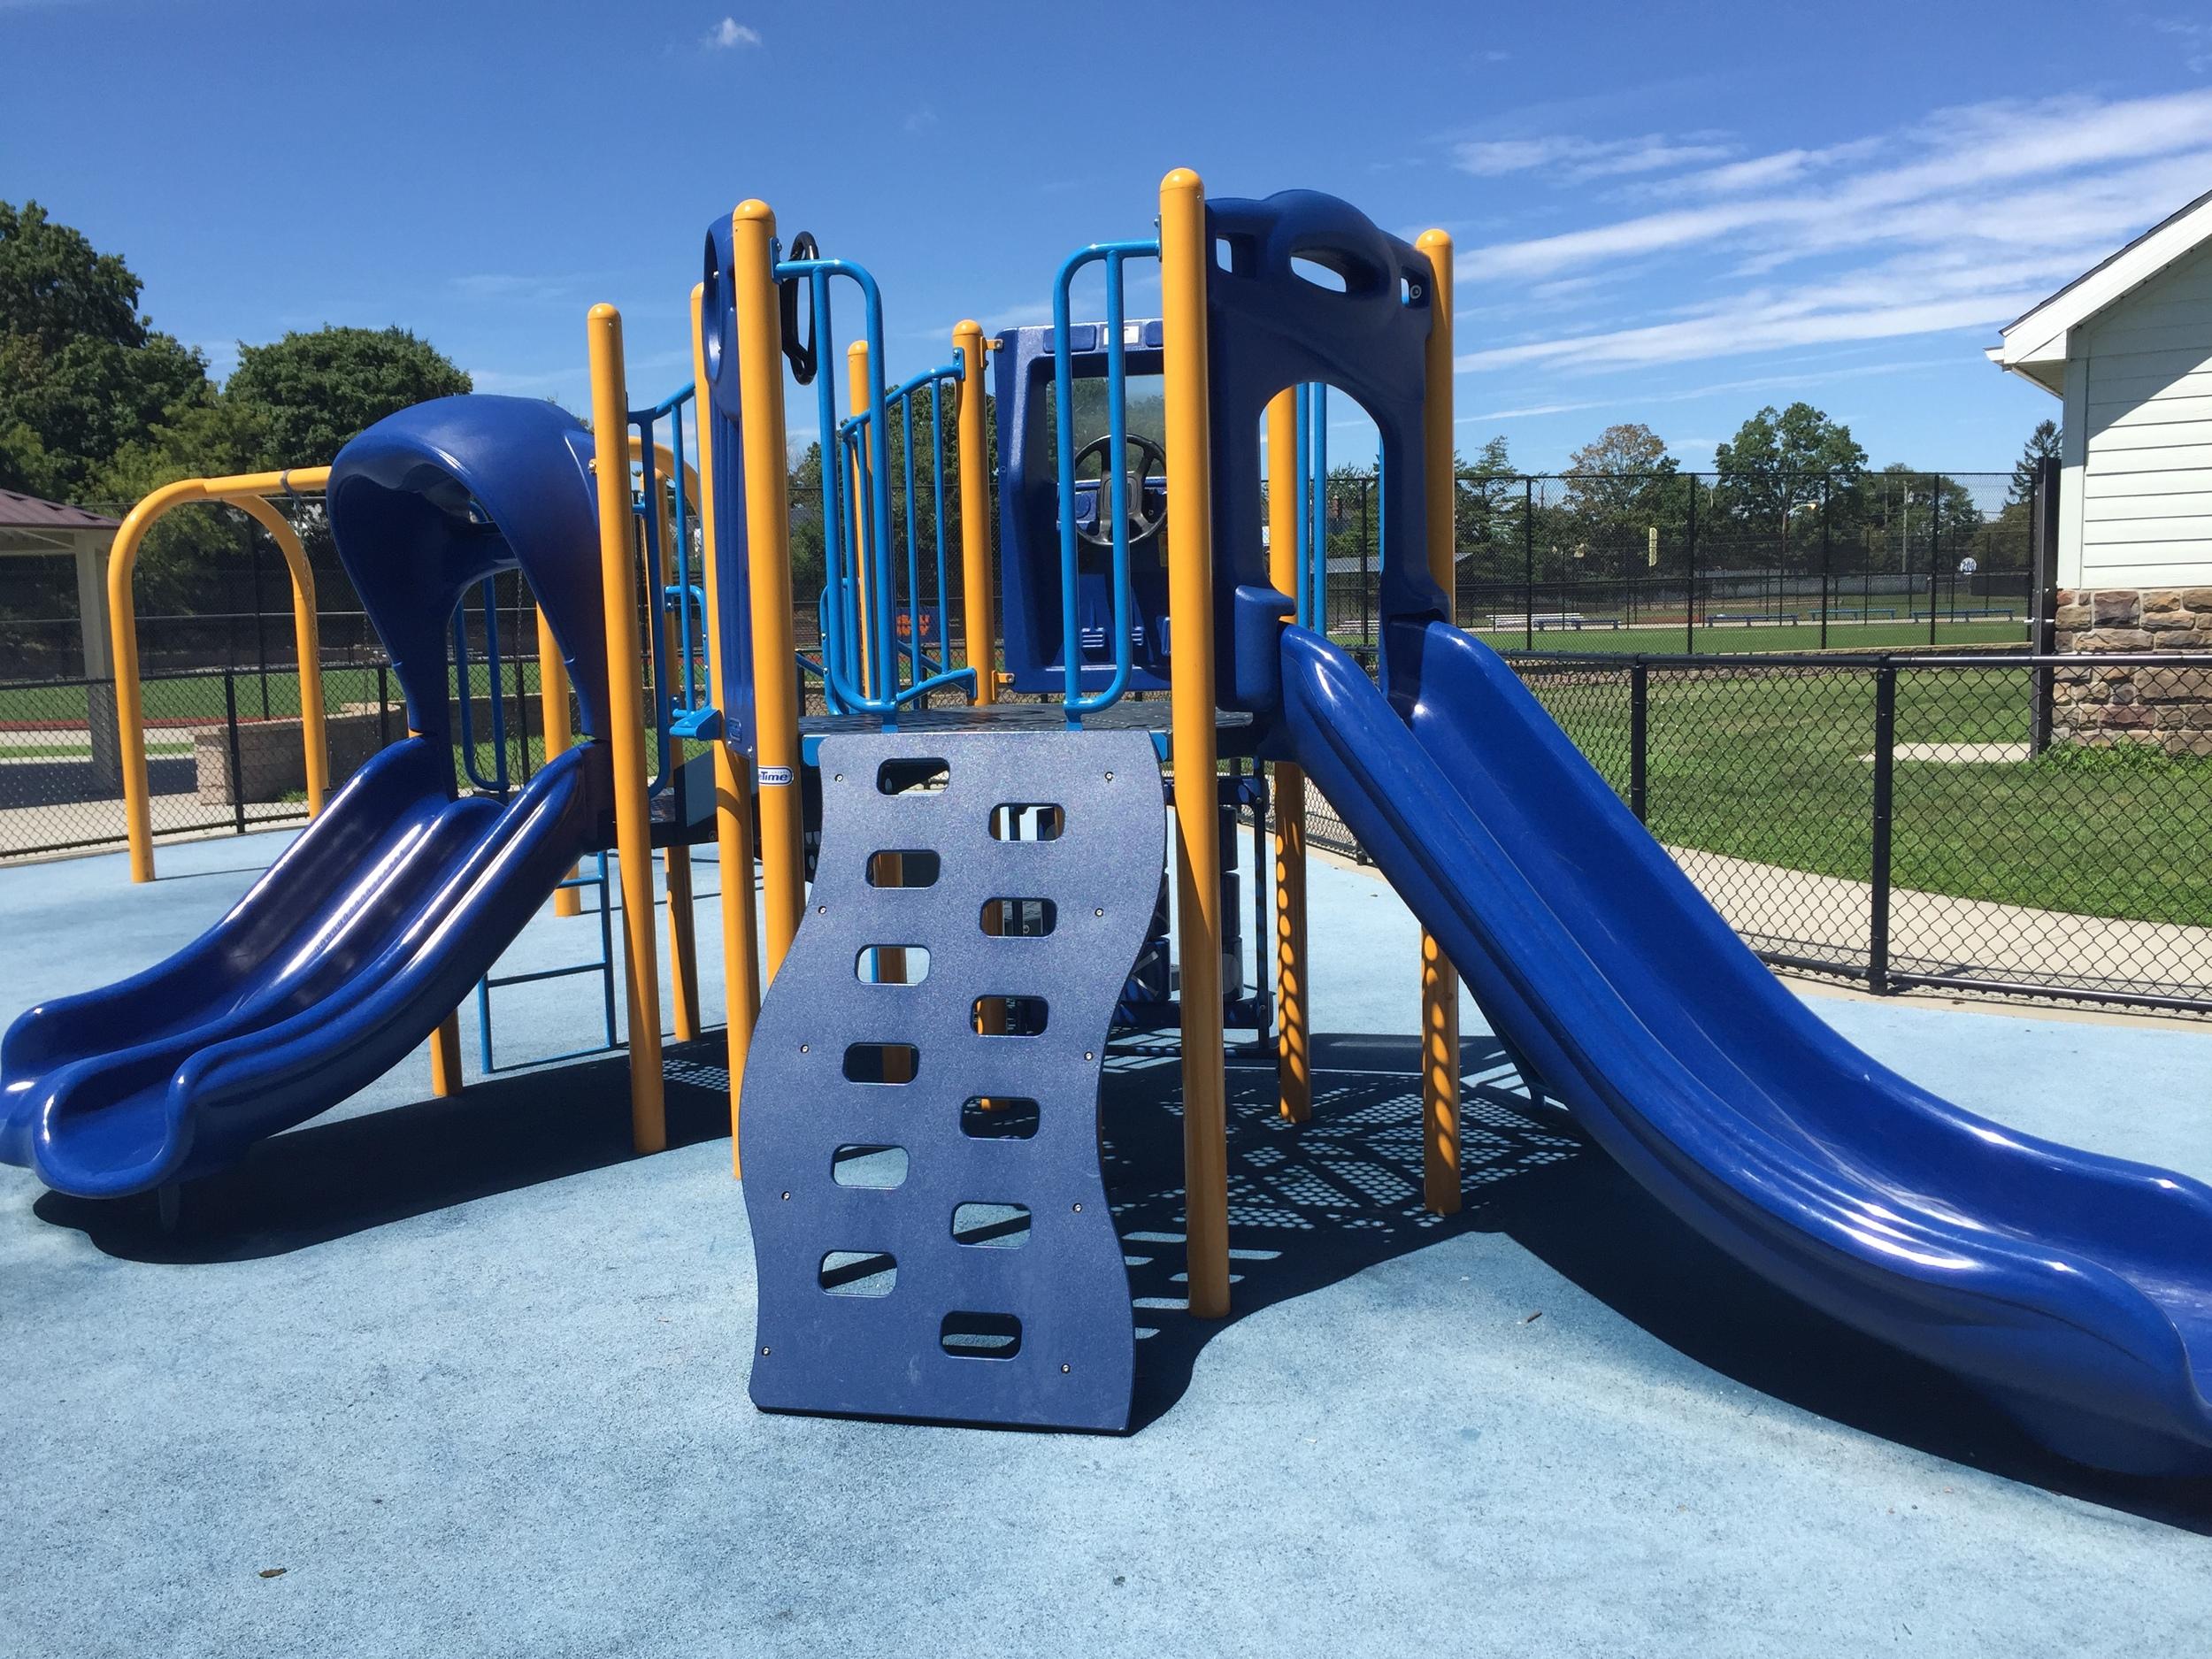 Little kid playground at Grant Park